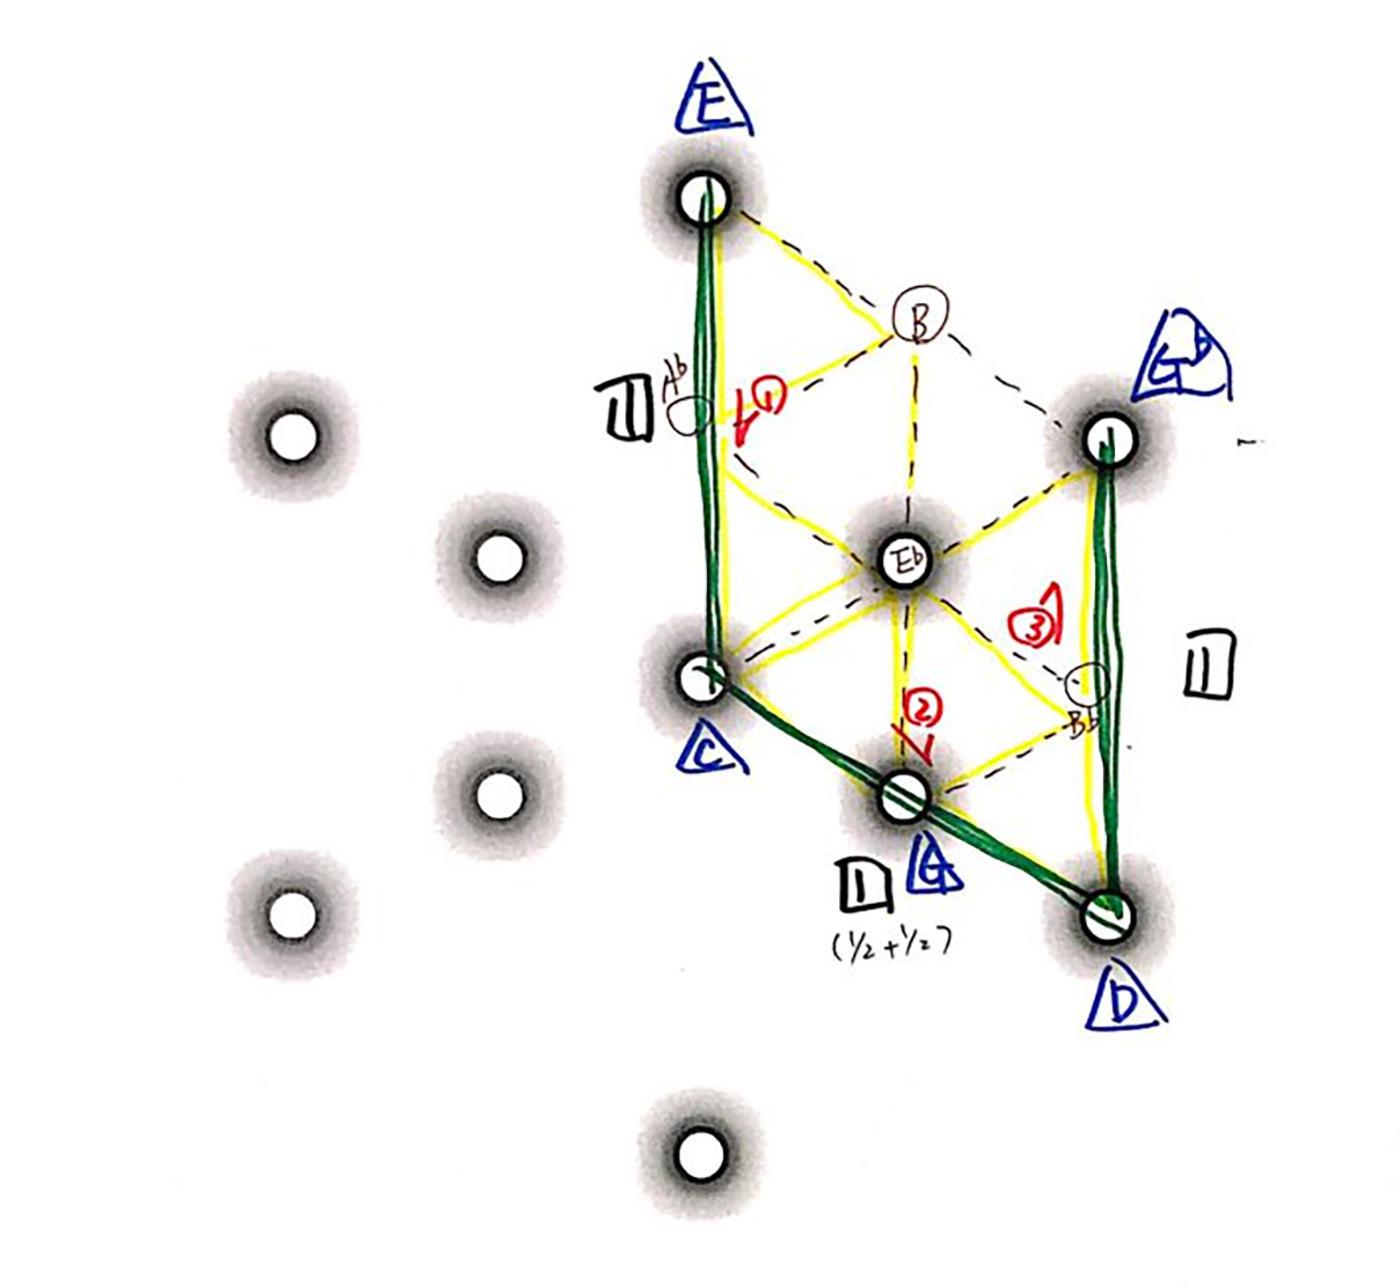 http://ingress.lycaeum.net/2017/04/GlyphMusic.jpg